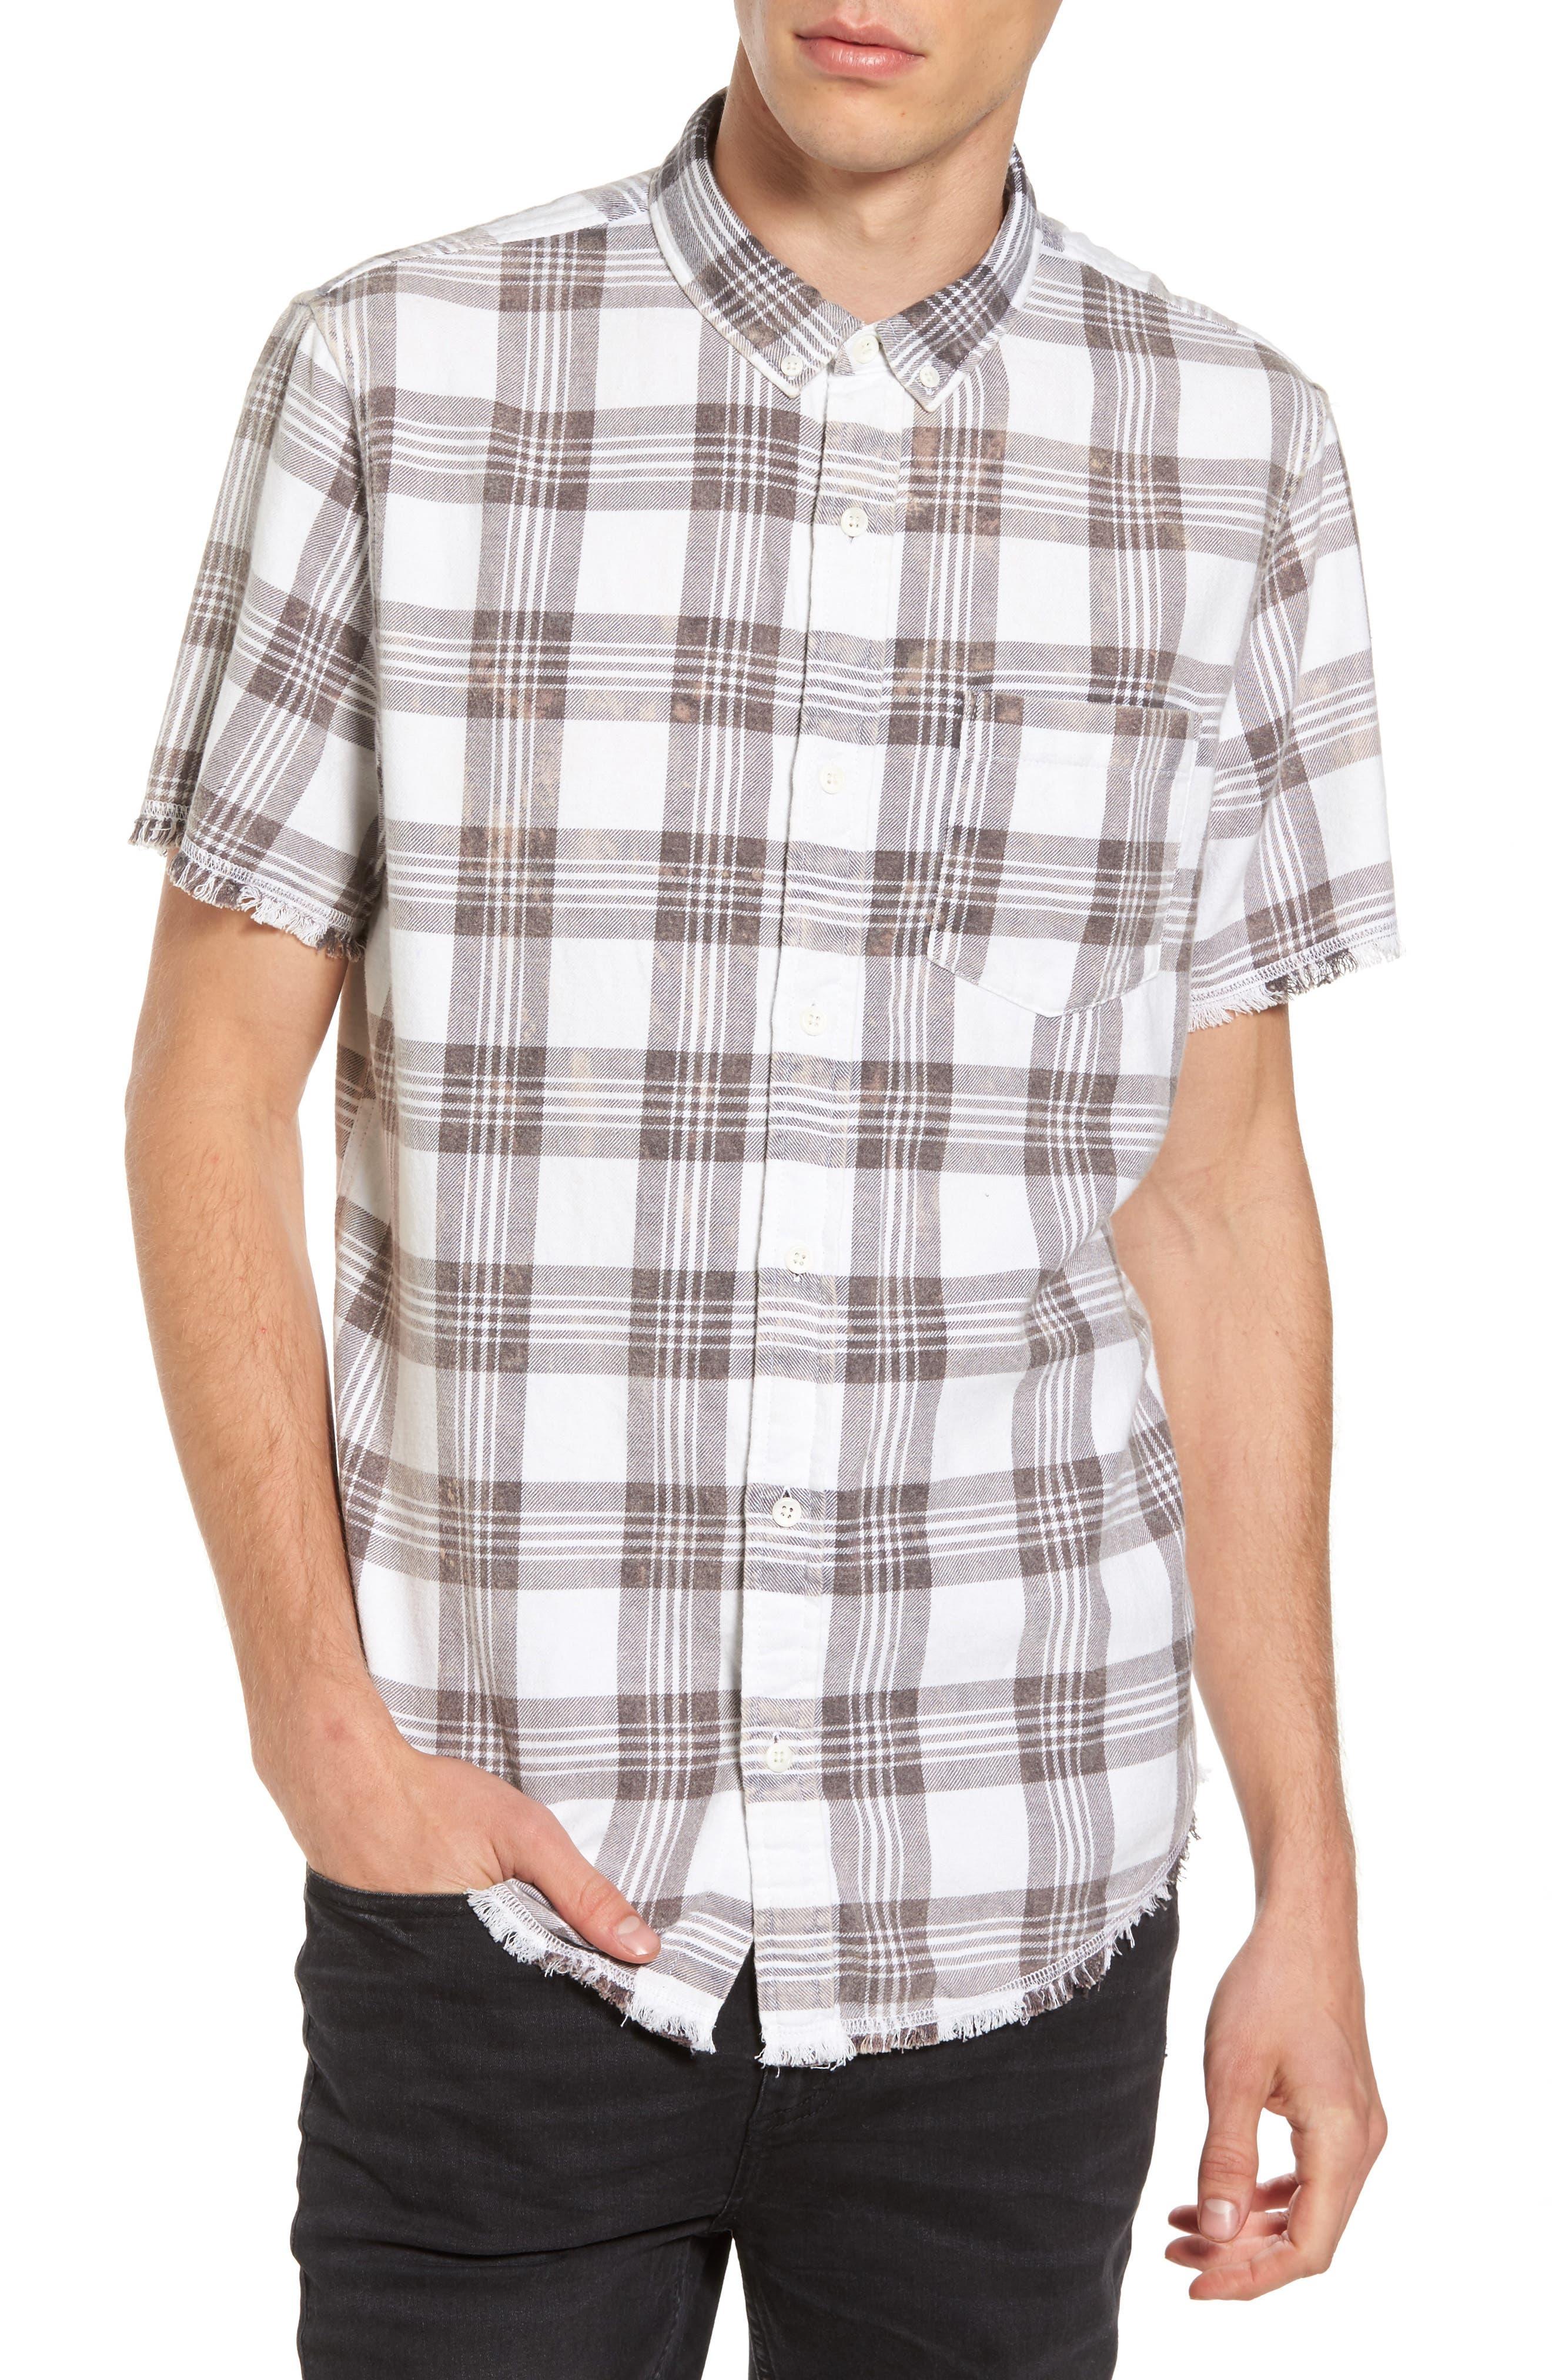 Alternate Image 1 Selected - The Rail Bleach Plaid Shirt